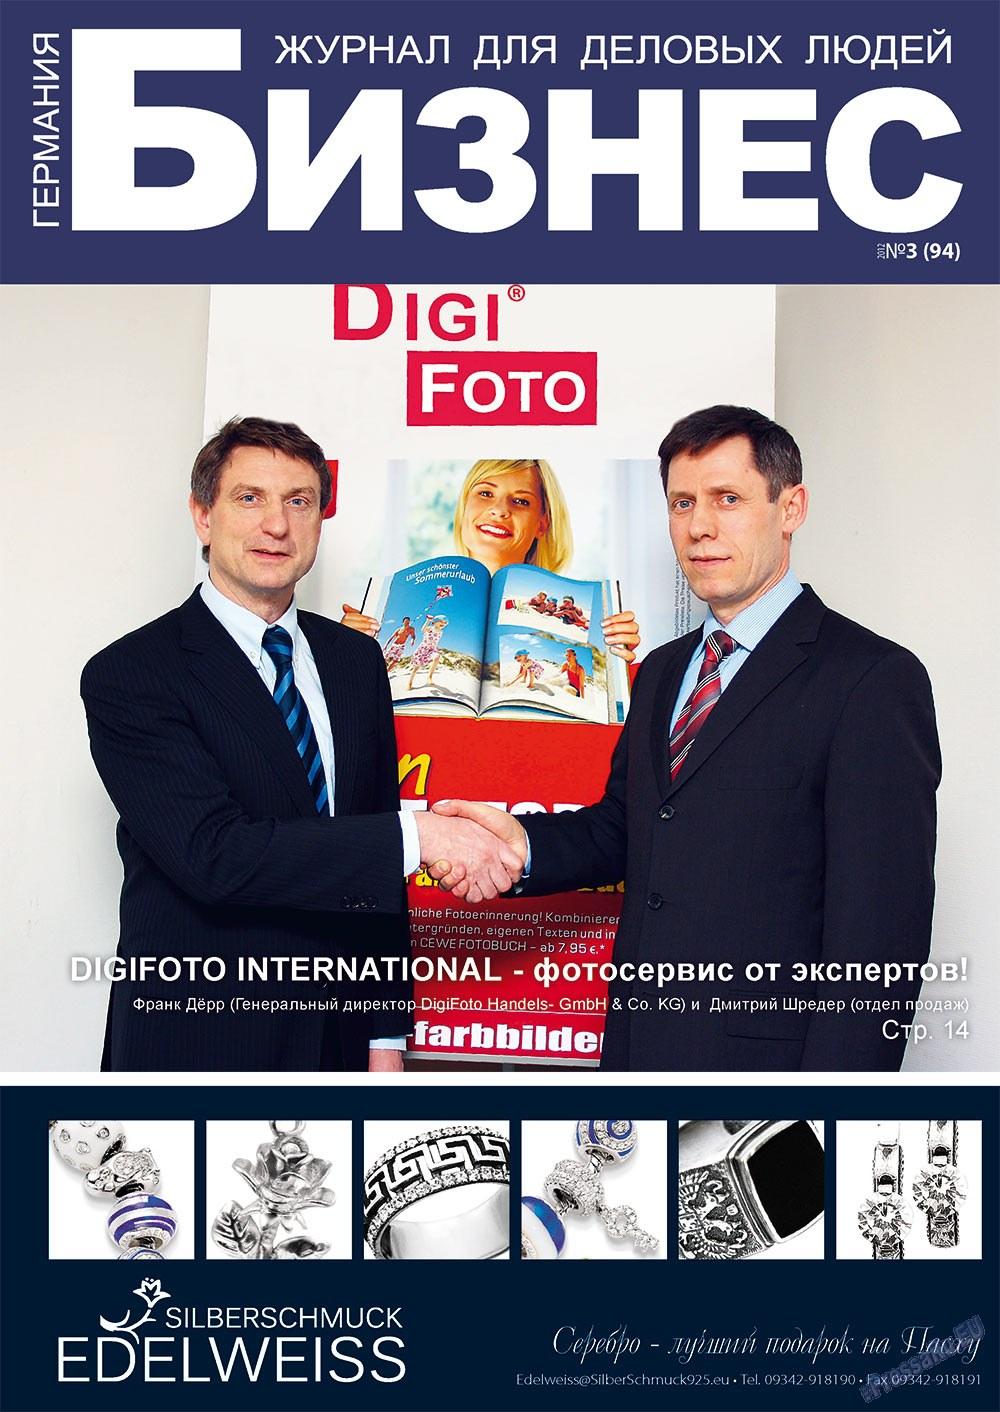 Бизнес (журнал). 2012 год, номер 3, стр. 1